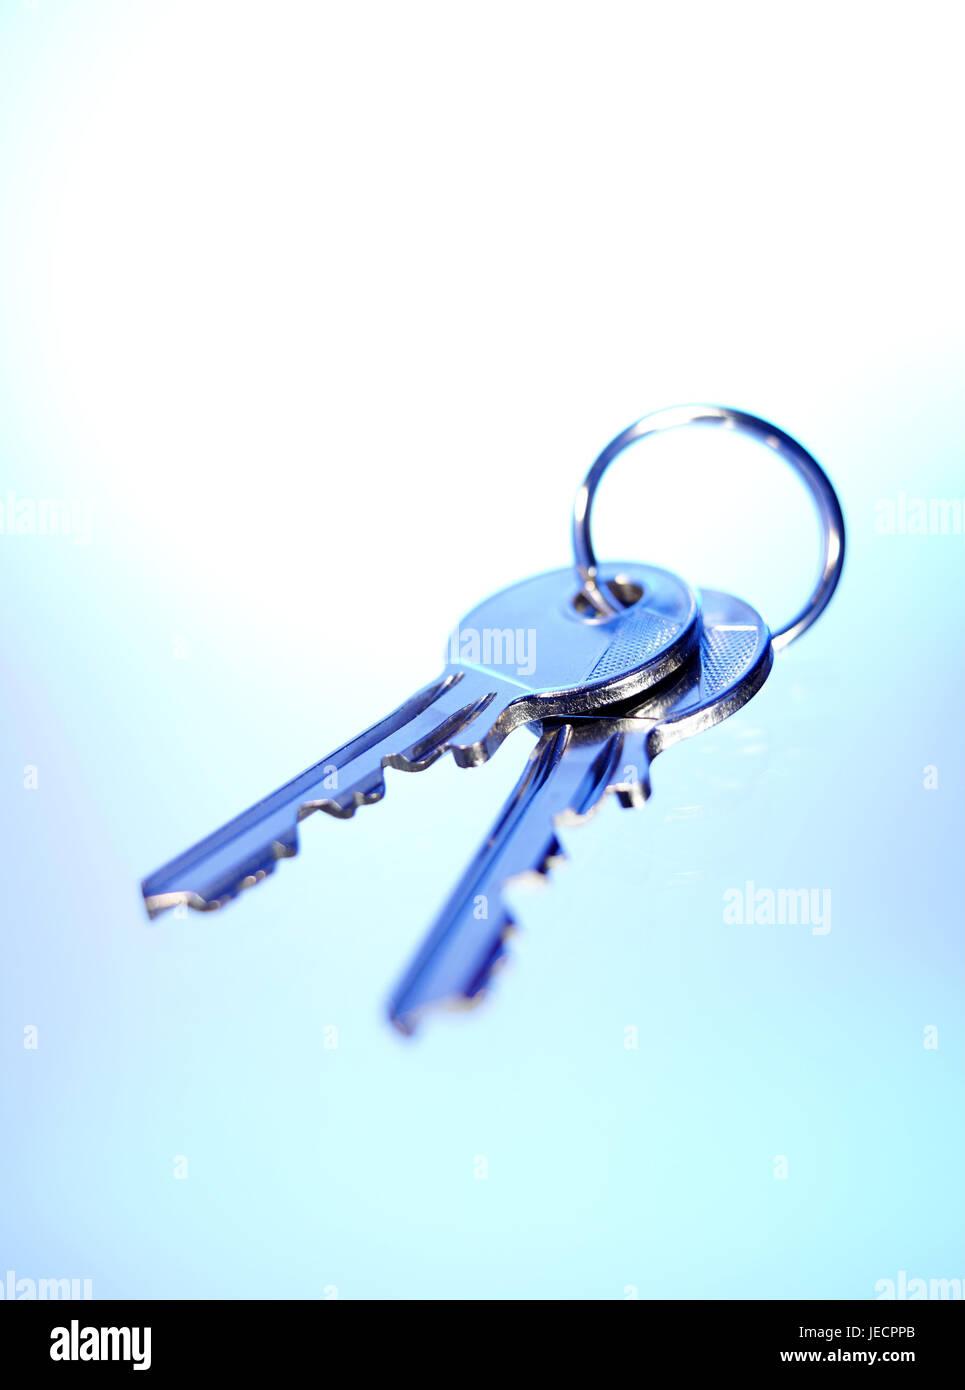 Türschloss Sicherheit schlüssel symbol sicherheit gegenlicht türschloss